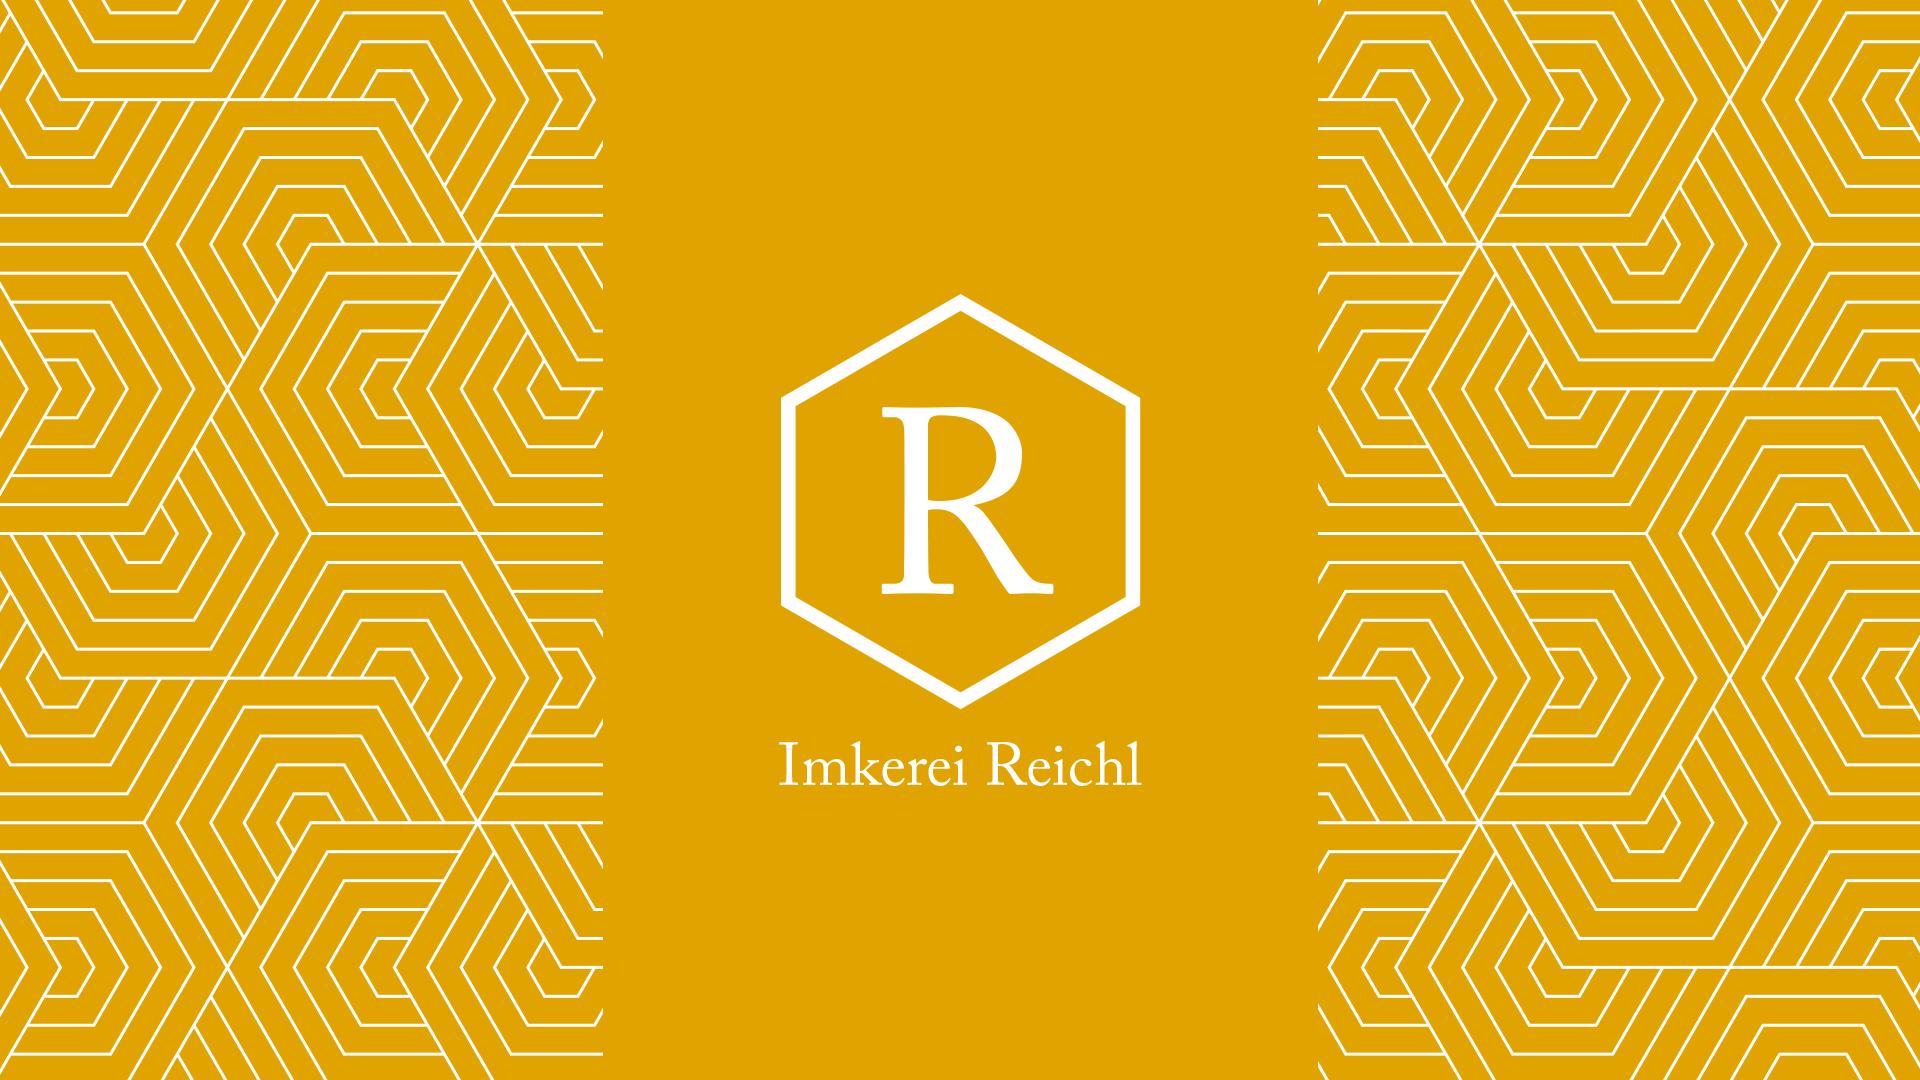 Imkerei Reichl 01